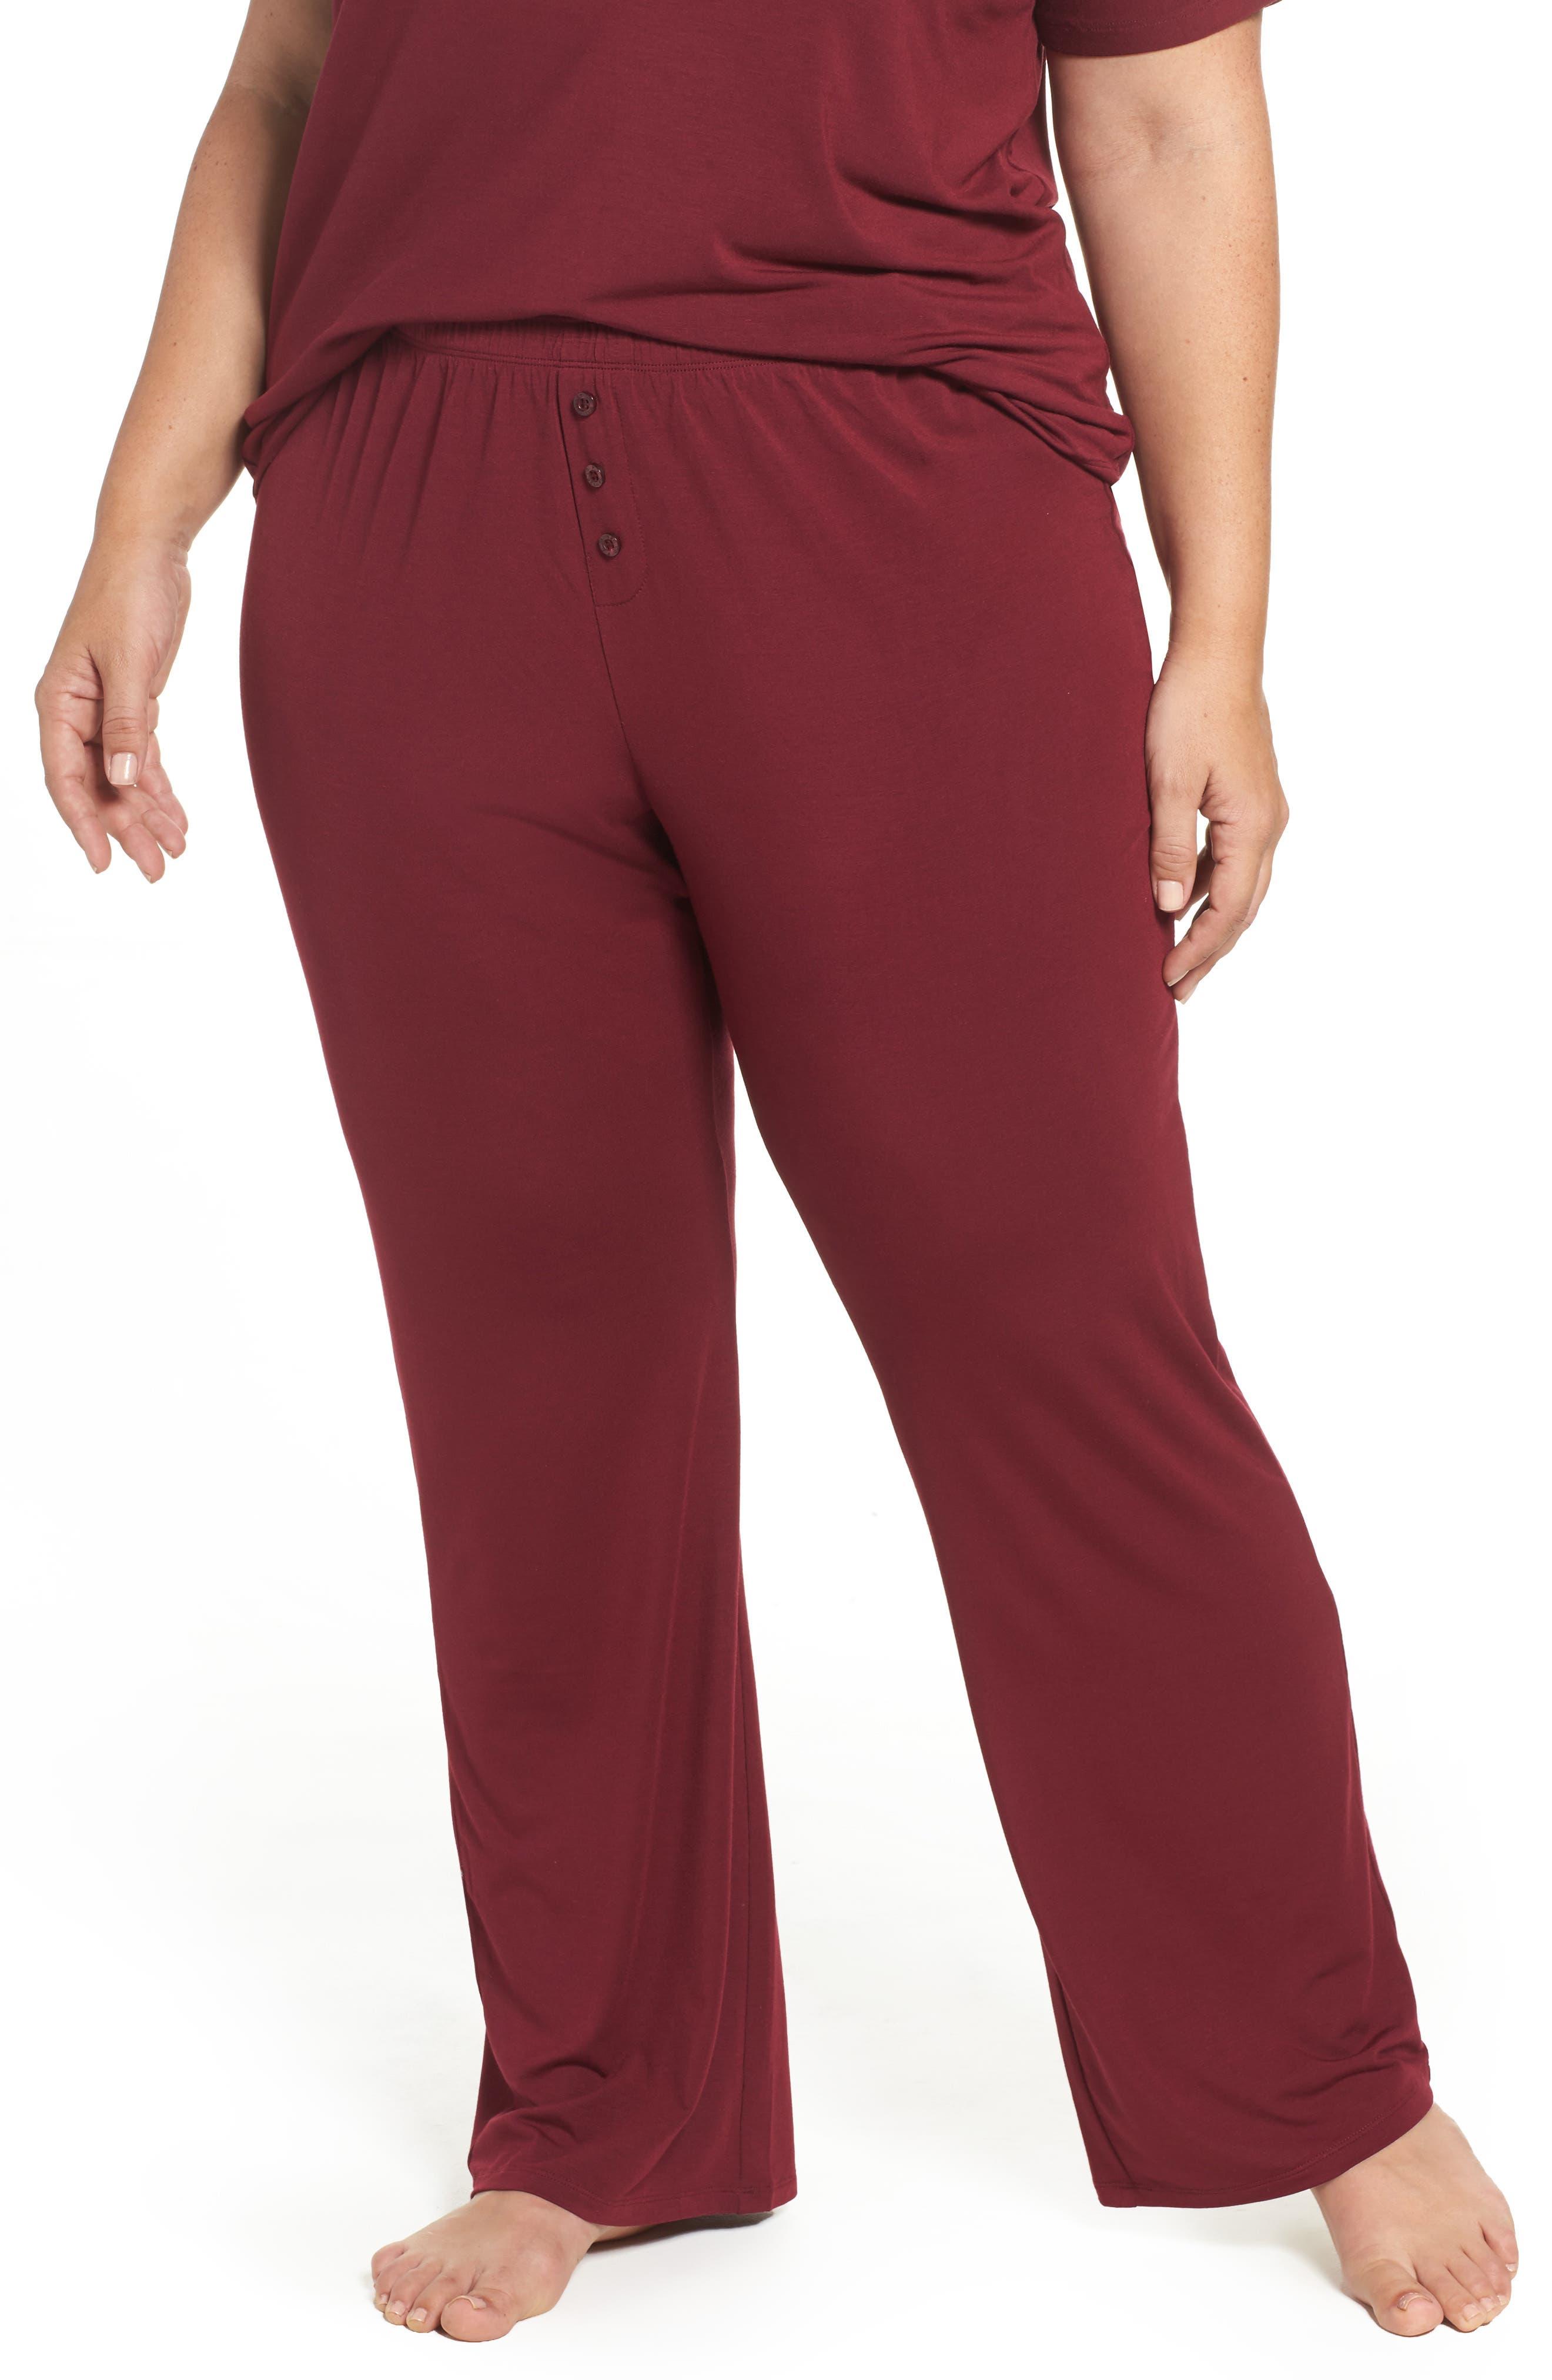 PJ SALVAGE Lounge Pants